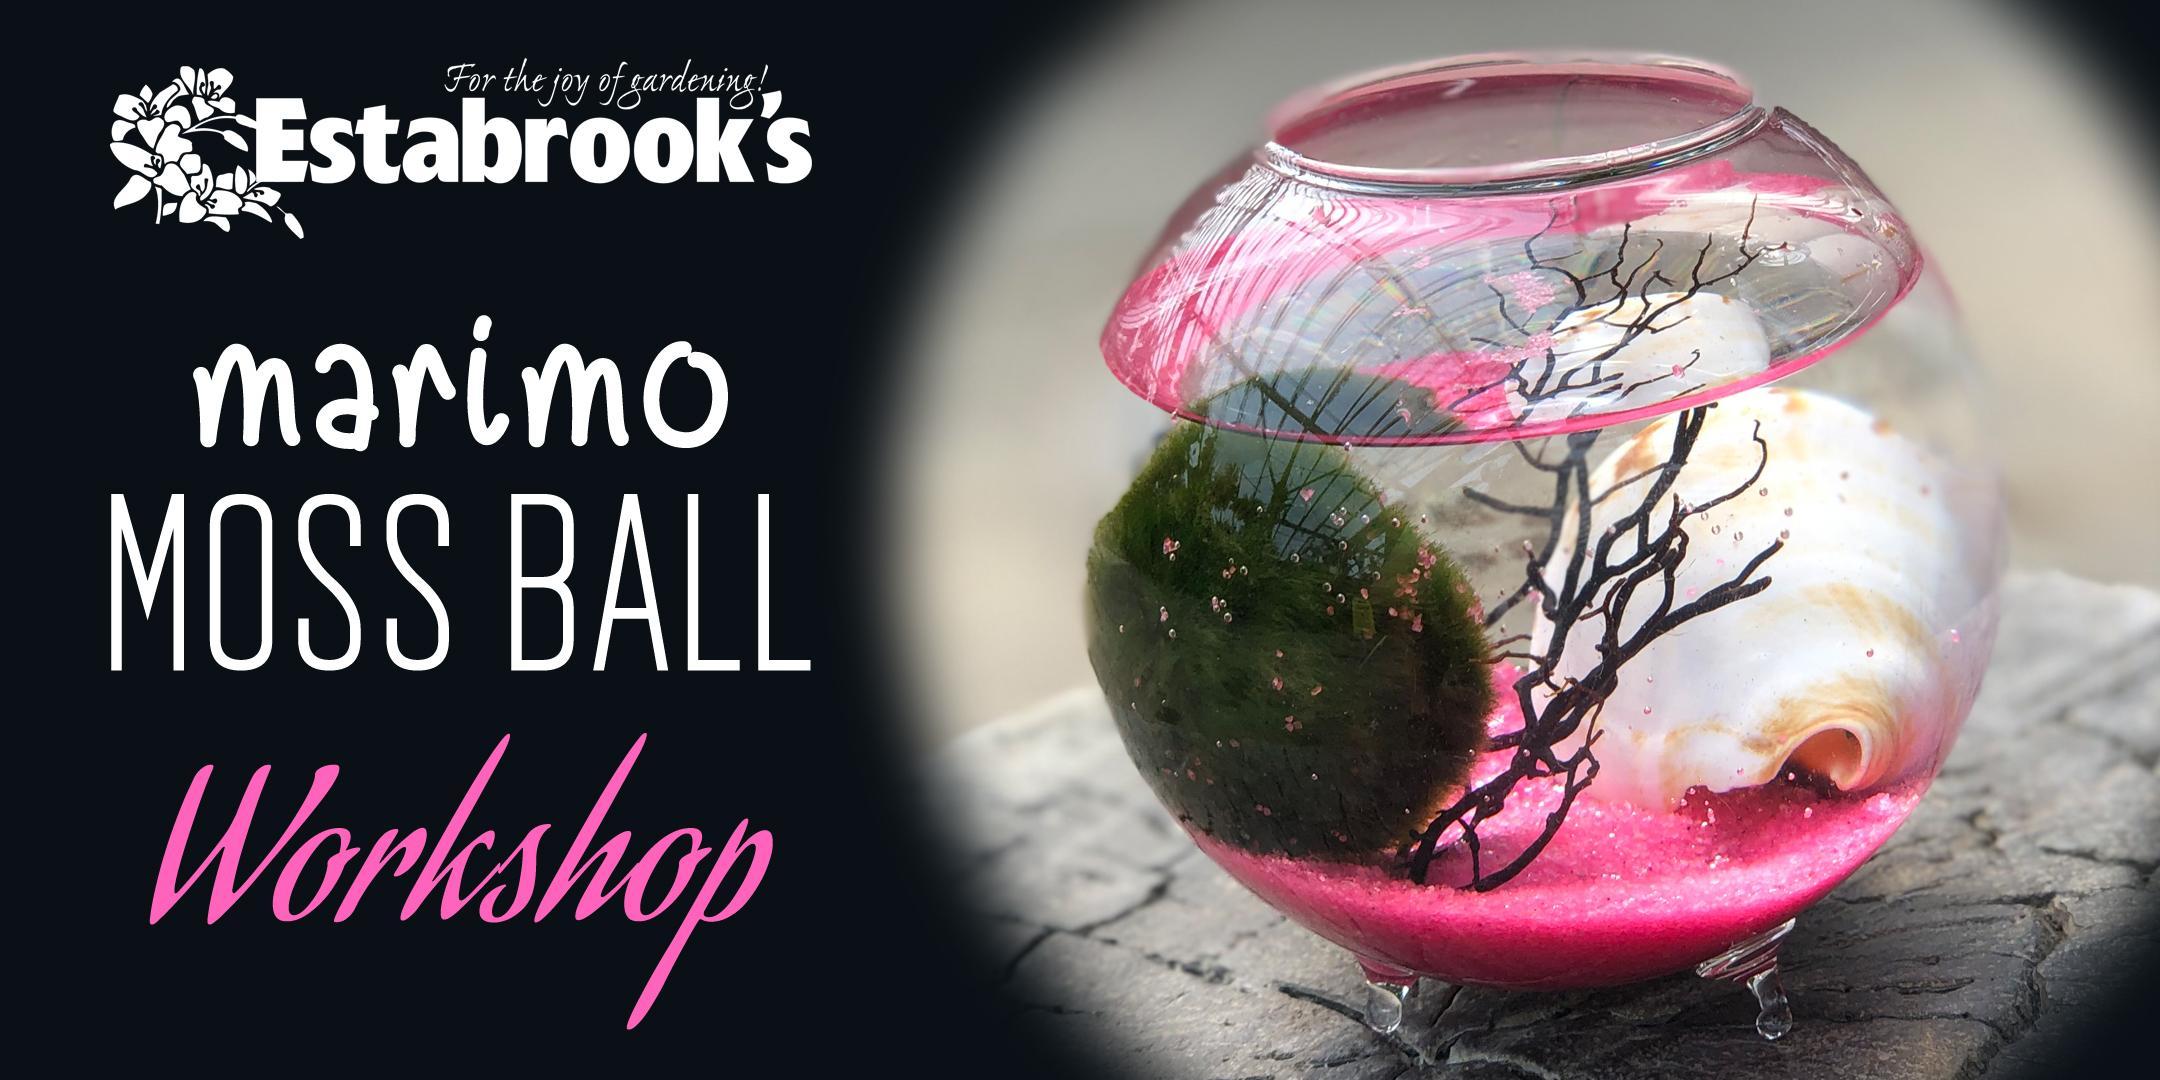 Marimo Moss Ball Workshop